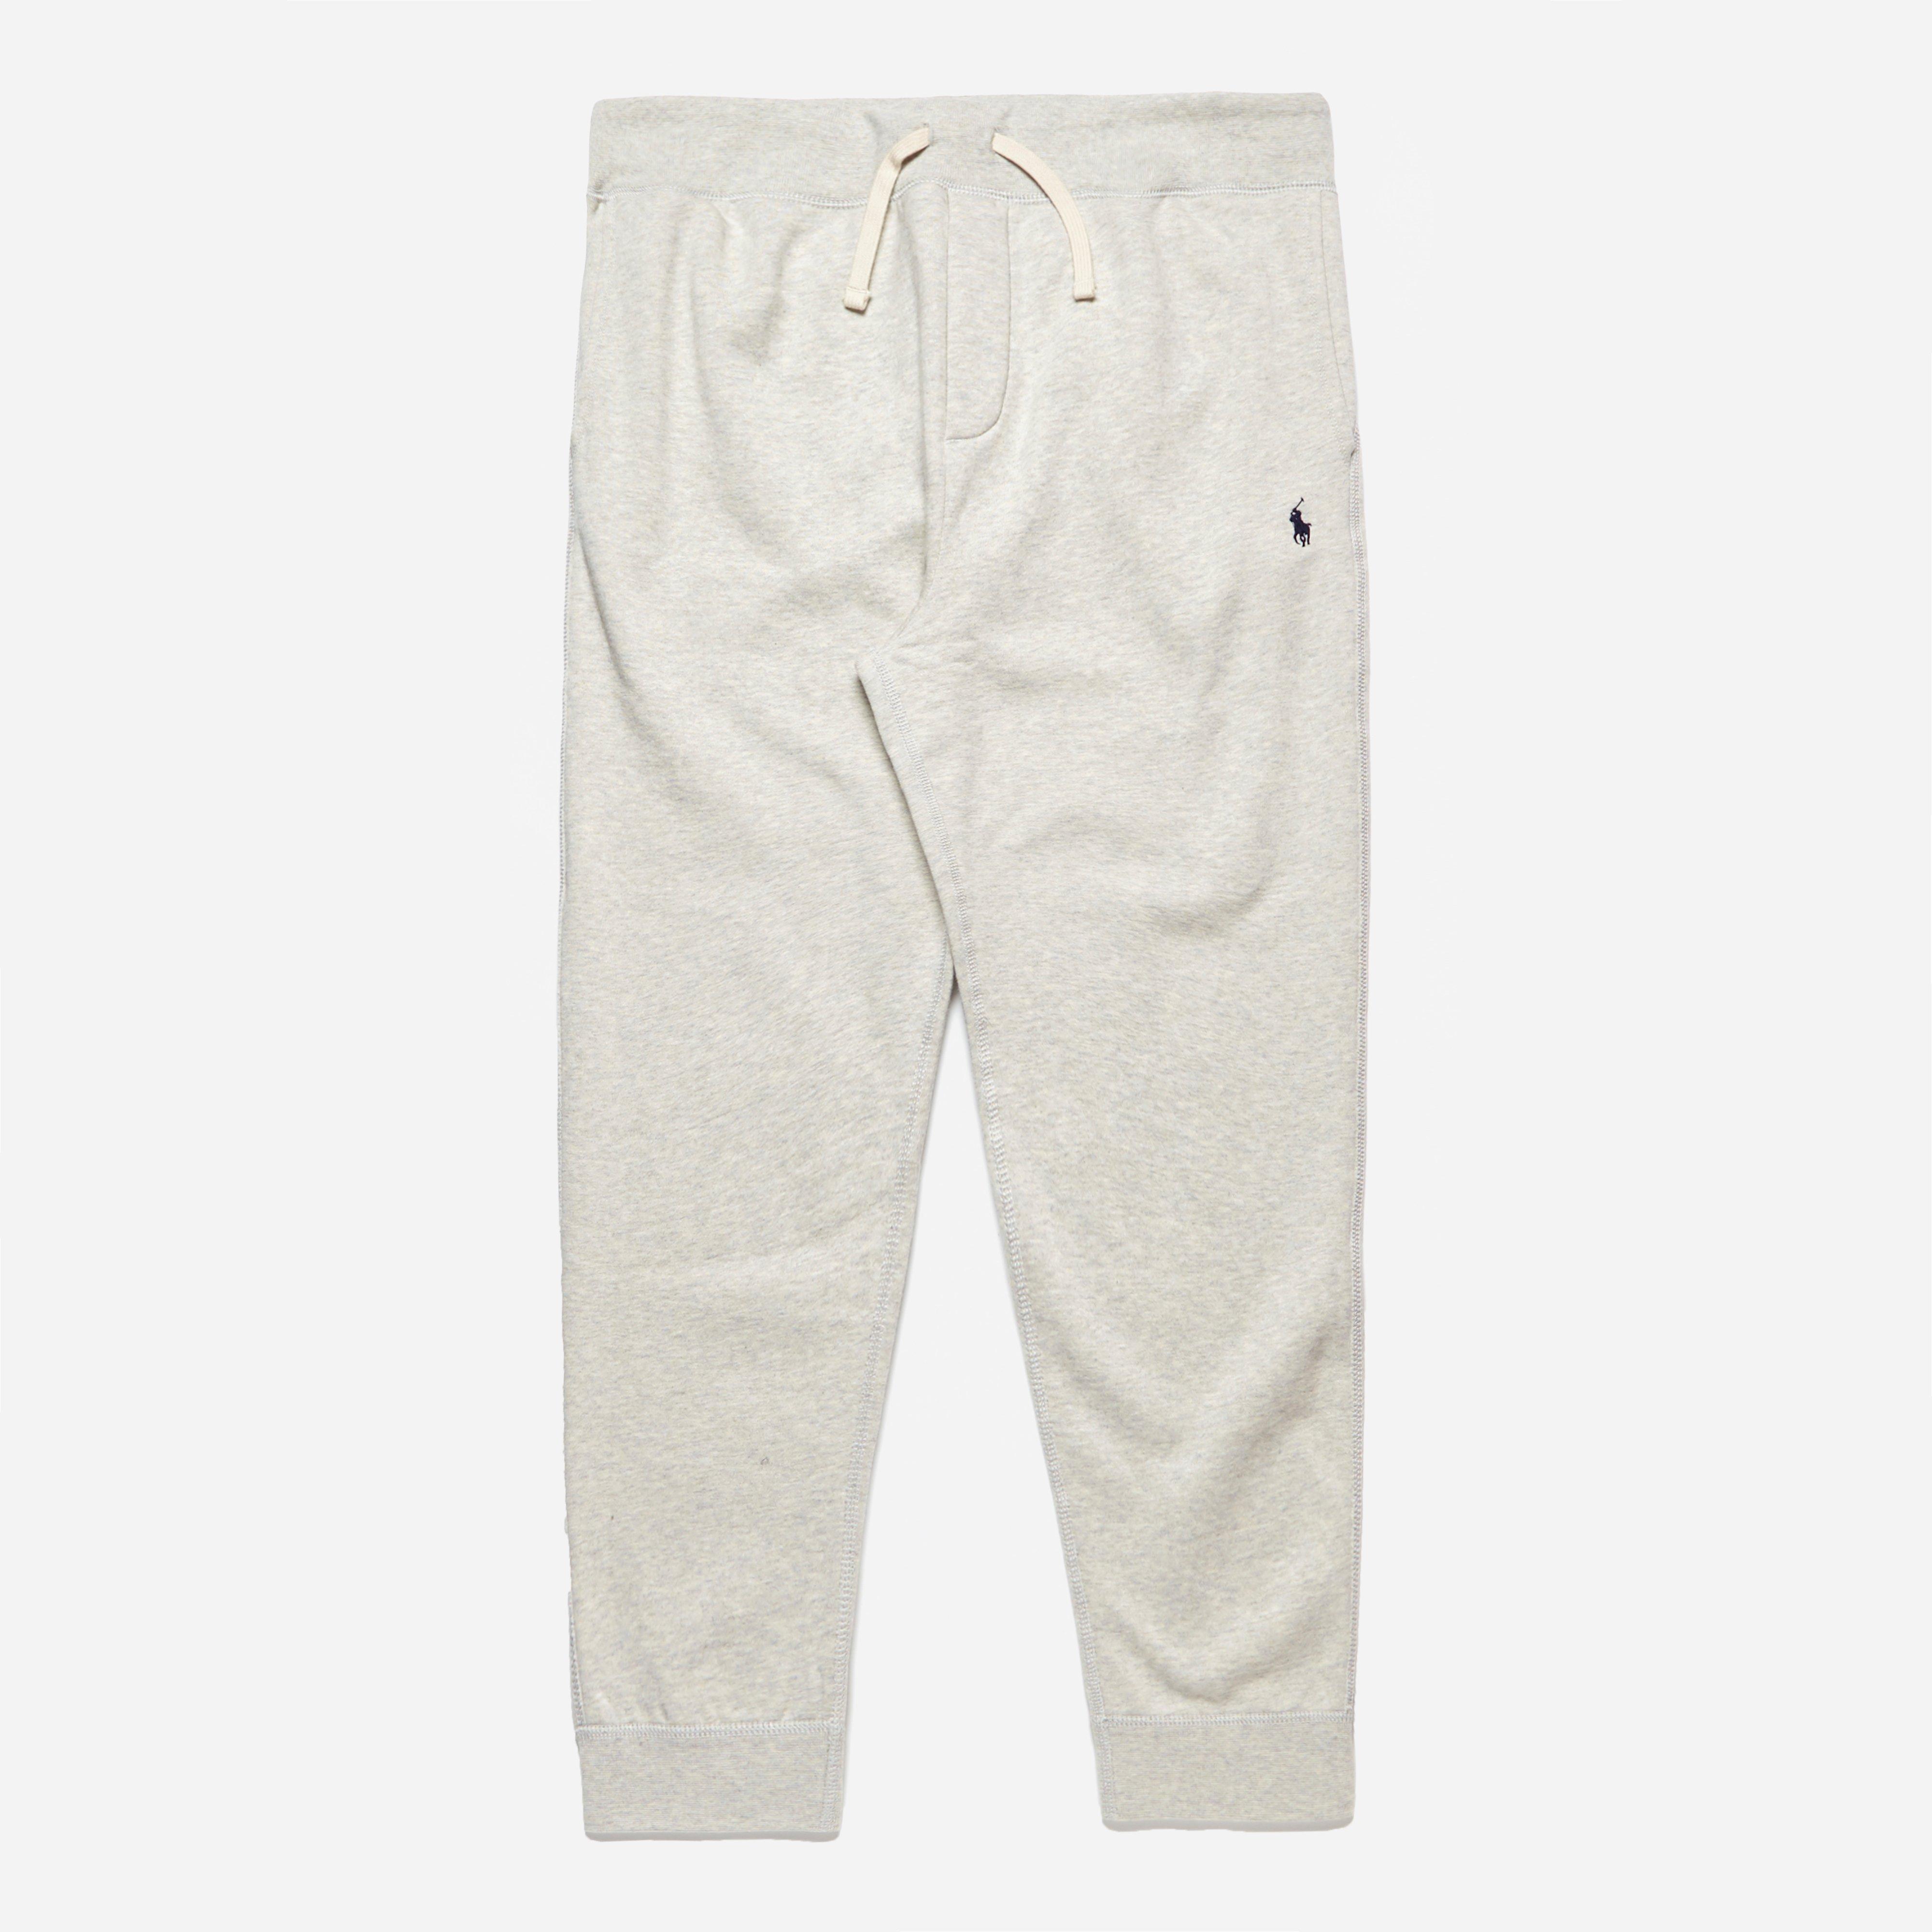 Polo Ralph Lauren Athletic Rib Cuff Fleece Pants